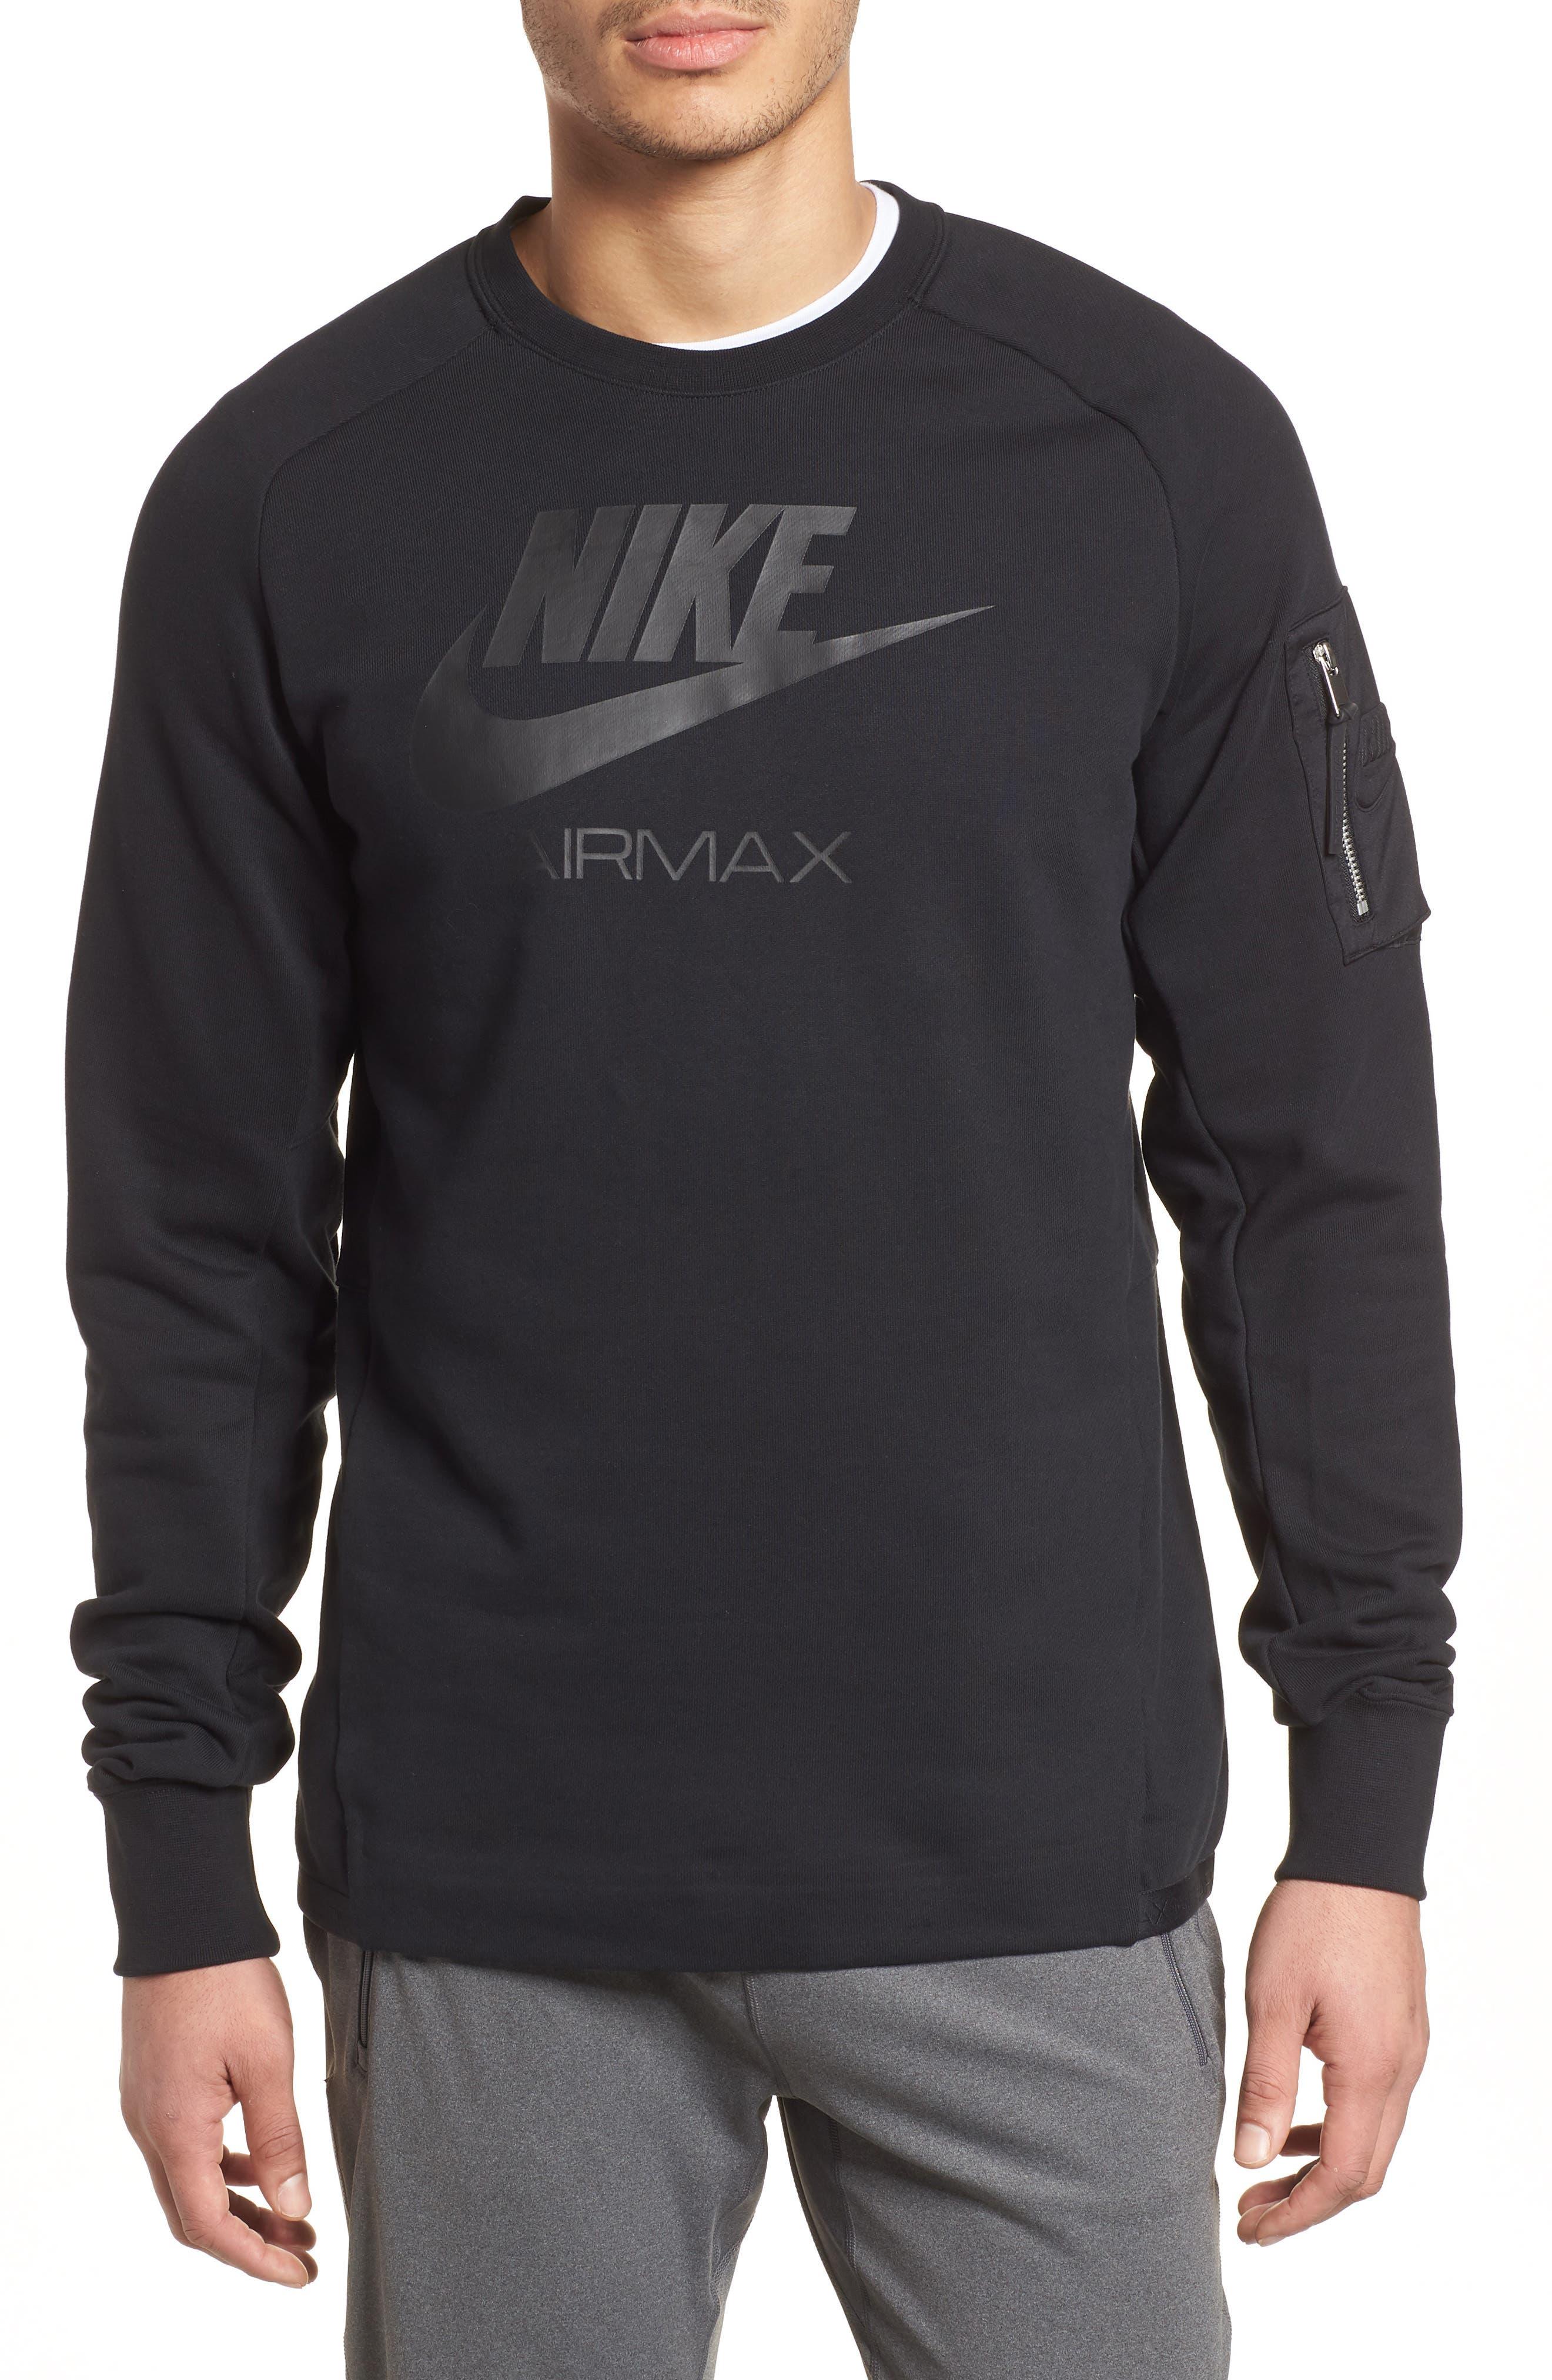 NSW Air Max Crewneck Sweatshirt,                             Main thumbnail 1, color,                             Black/ Black/ Black